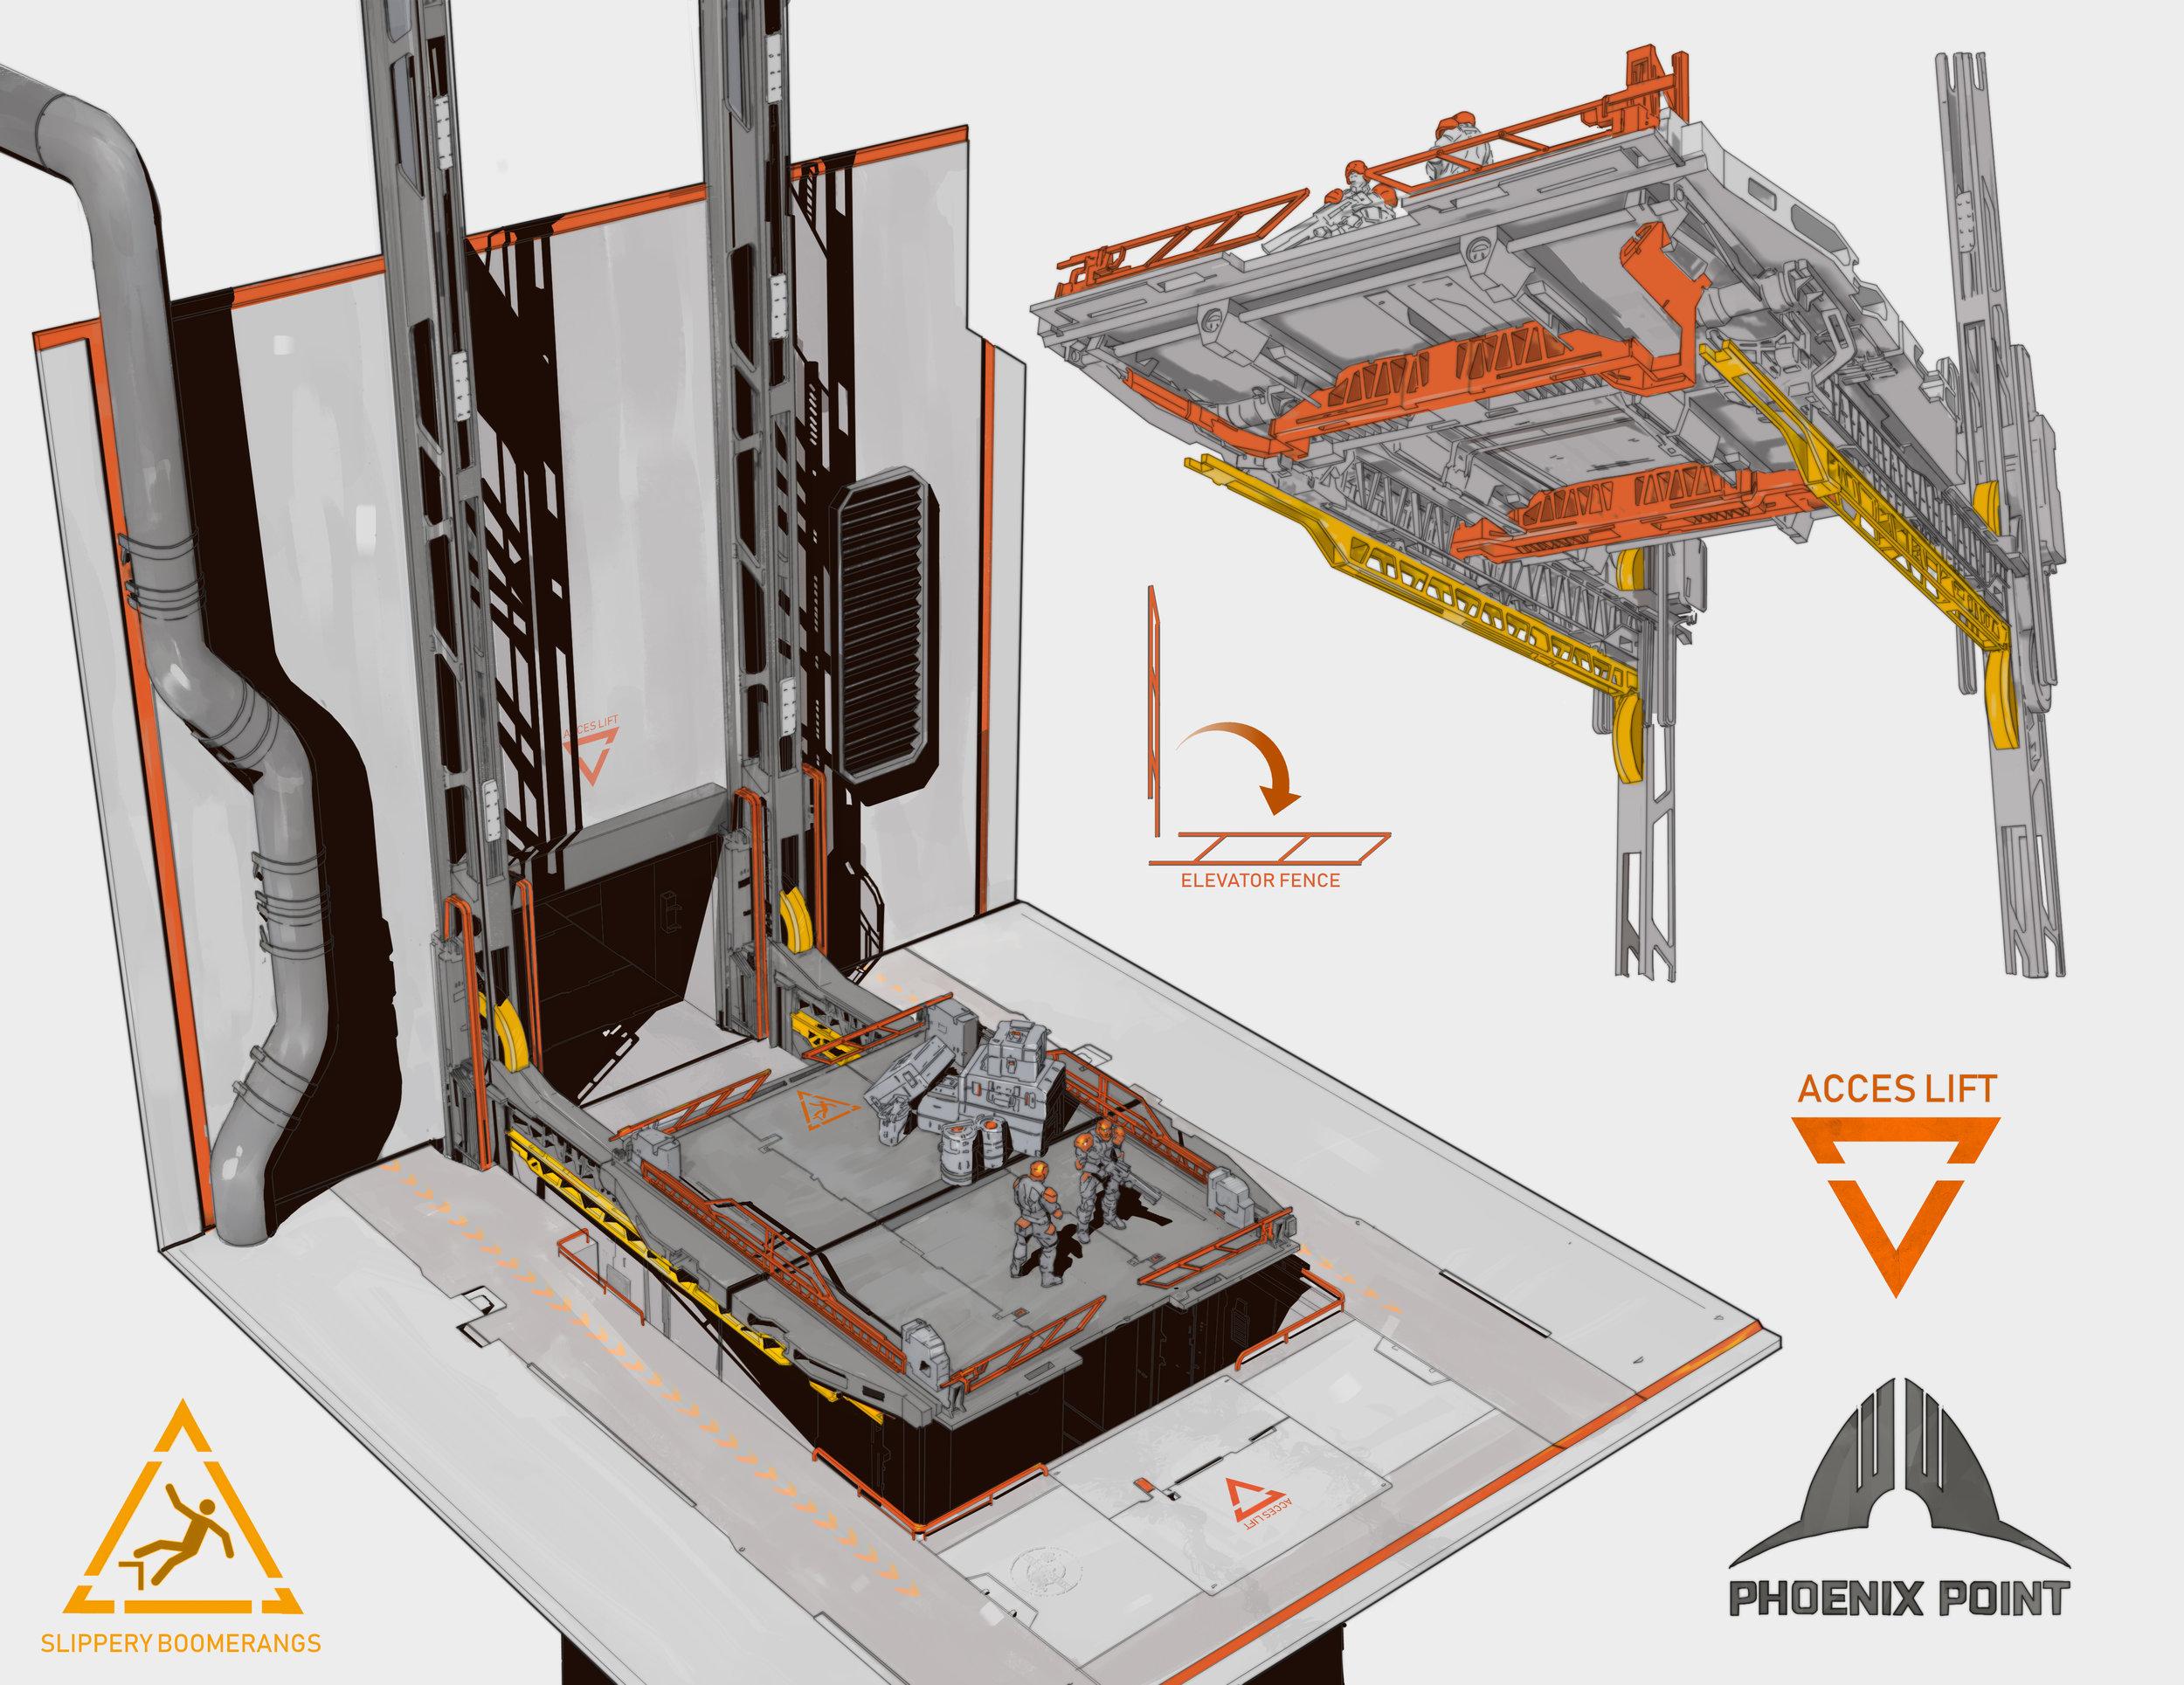 The elevator concept